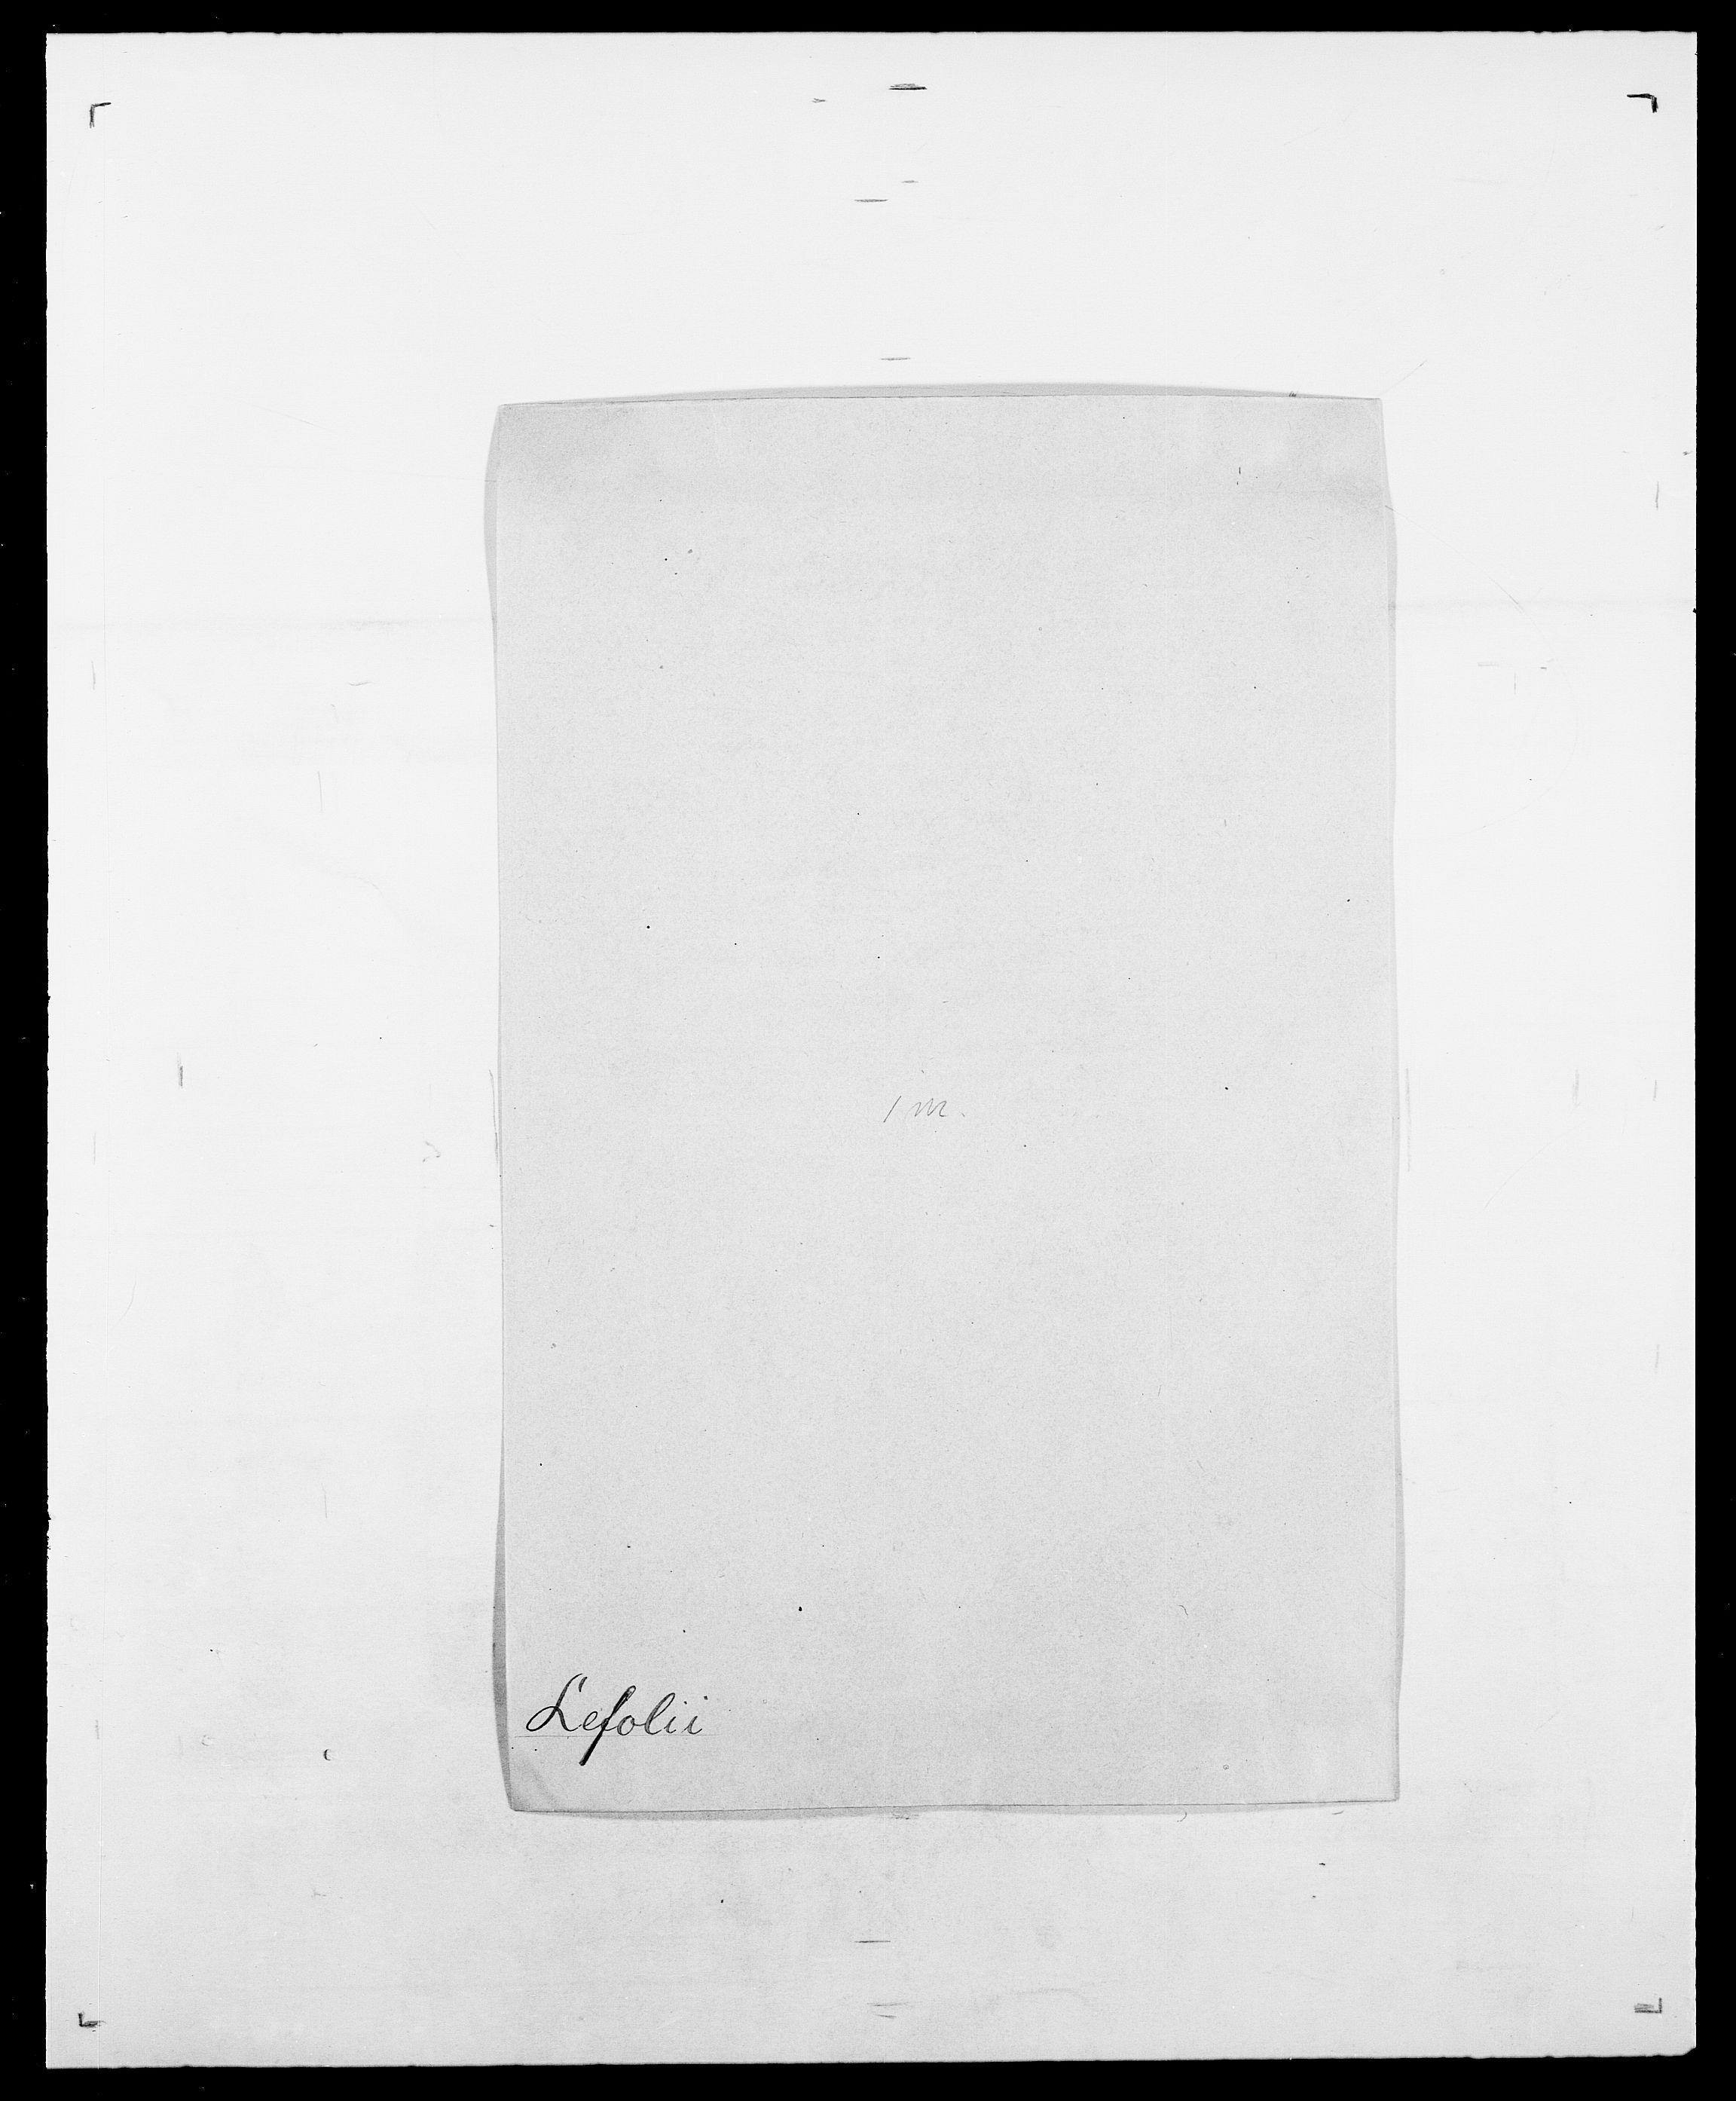 SAO, Delgobe, Charles Antoine - samling, D/Da/L0023: Lau - Lirvyn, s. 90